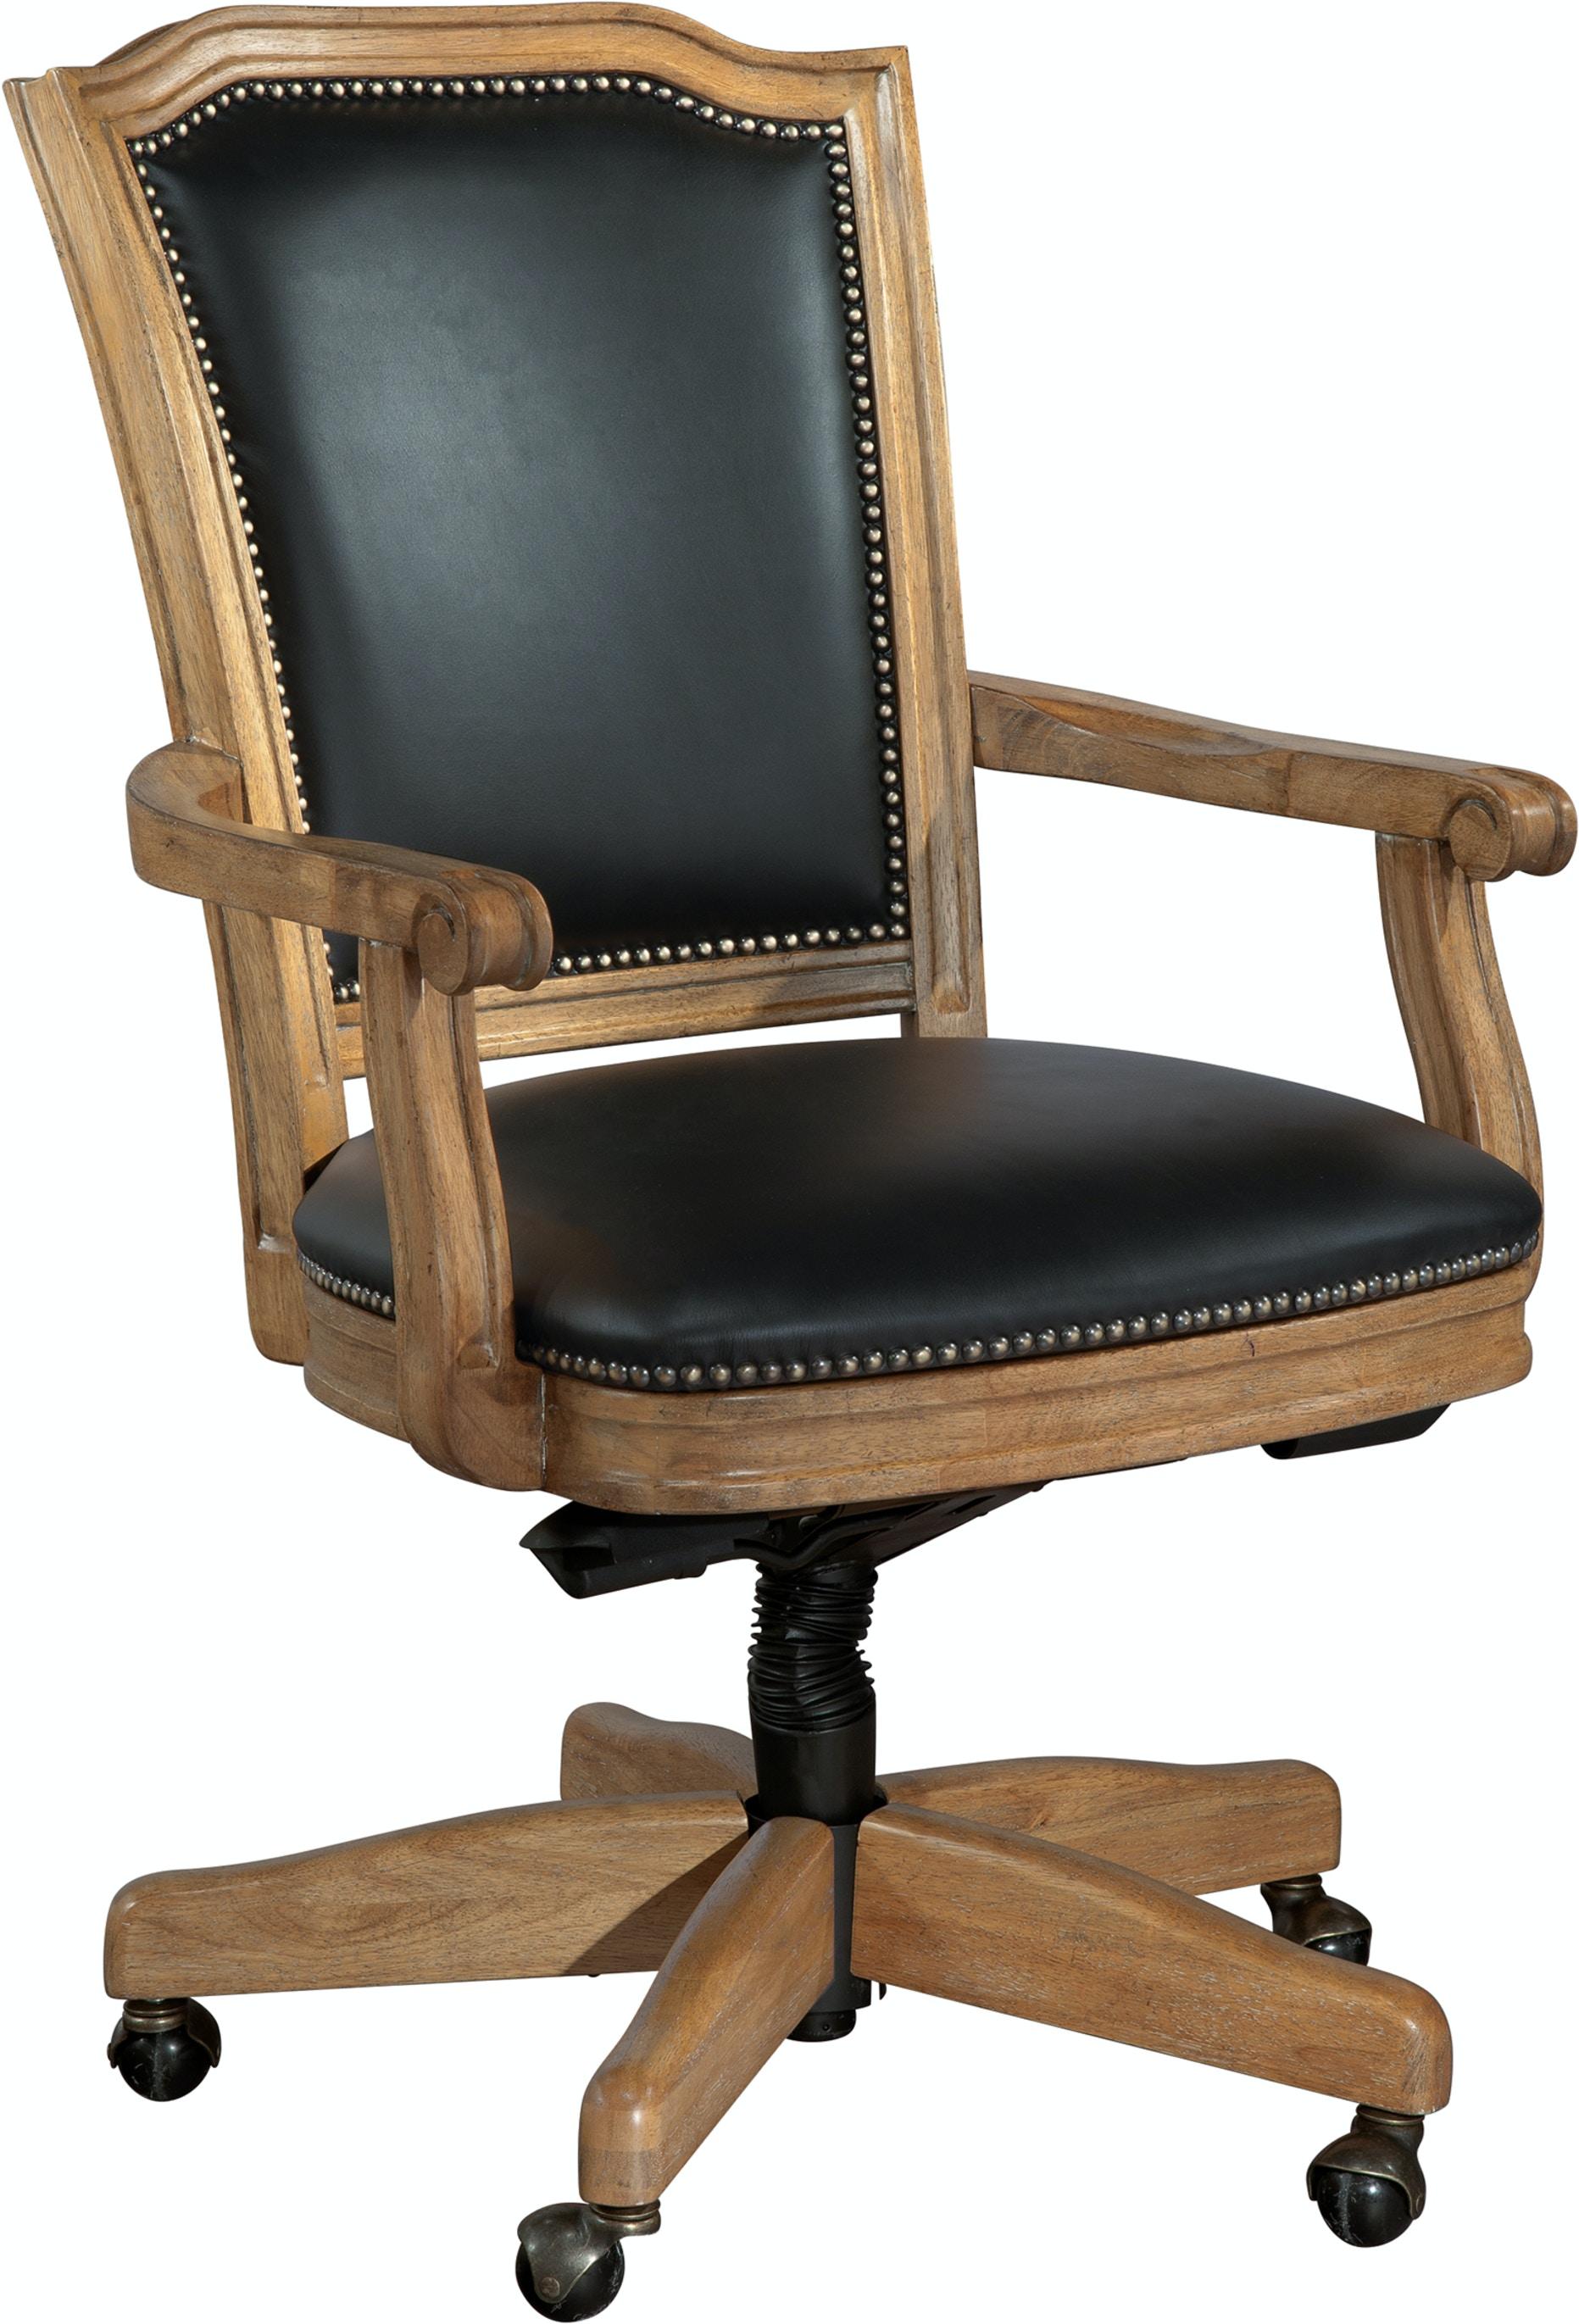 Hekman Home Office Executive Chair 79257b White House Designs For Life Fairfield Nj